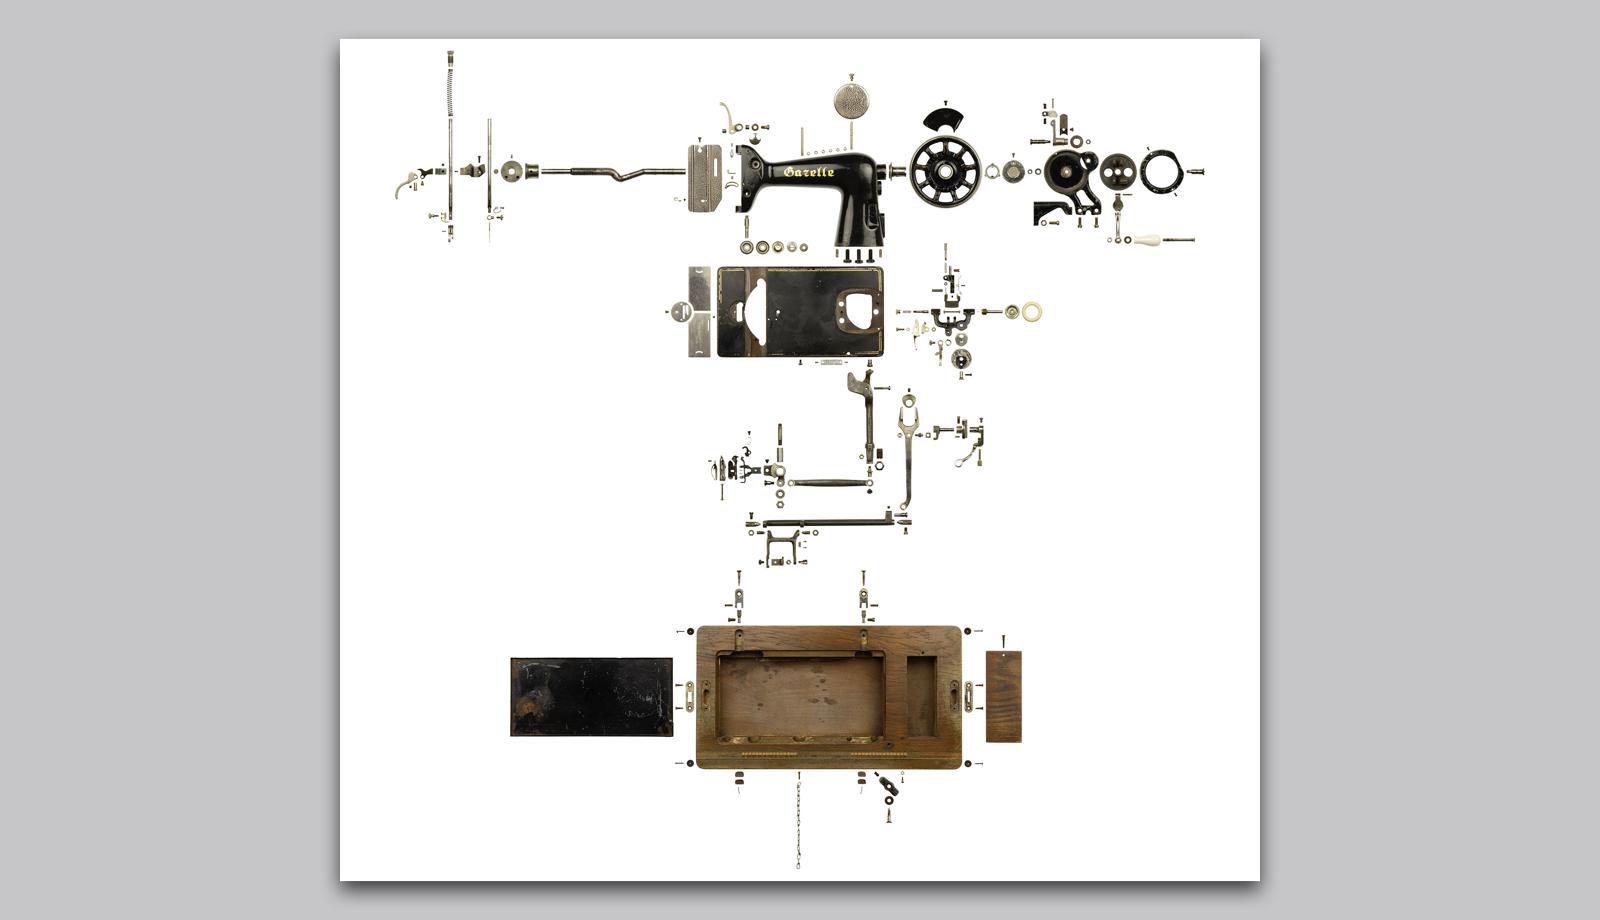 Publikation508_ReneSpitz-Designkritik_SpotOnDesign_DesignstudiumDigitalOderInspirierend